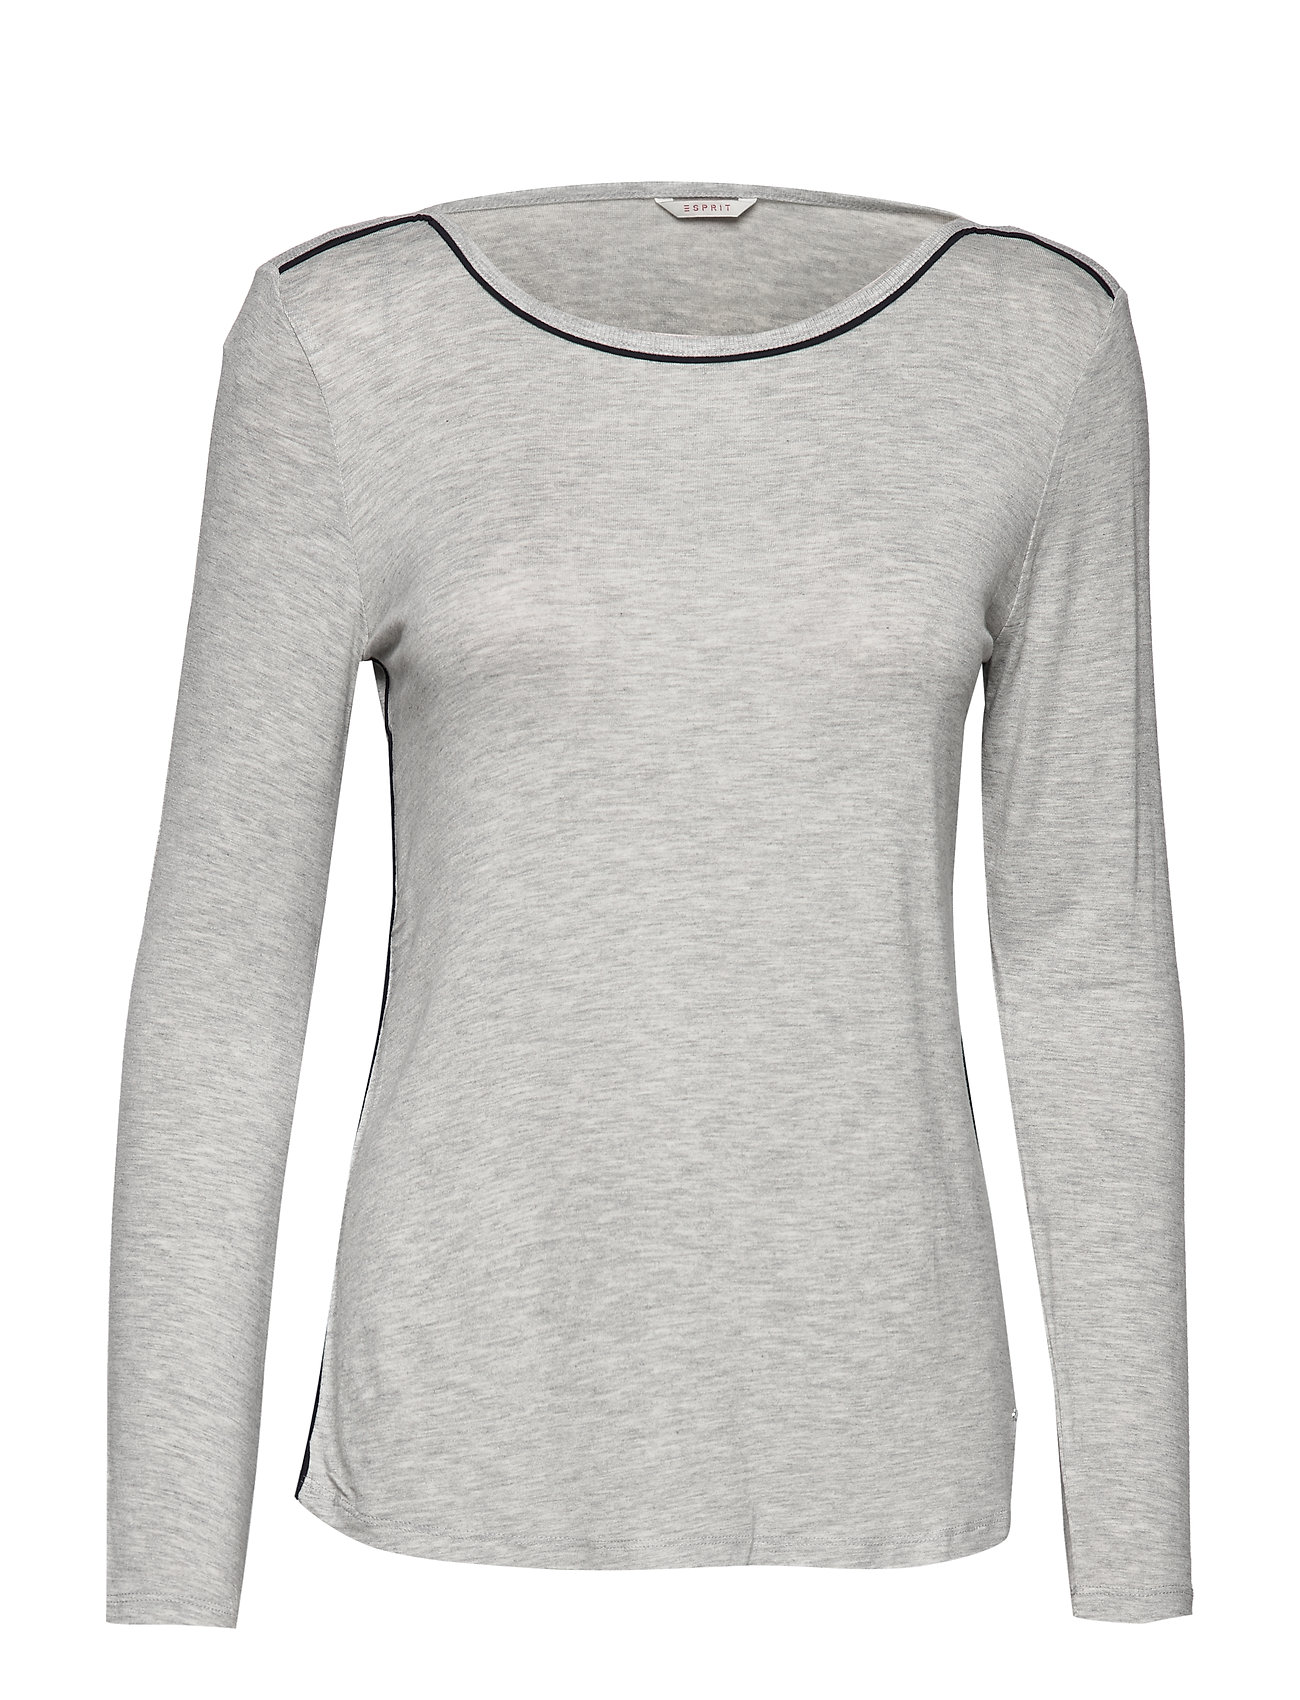 Esprit Bodywear Women Night-T-Shirts - LIGHT GREY